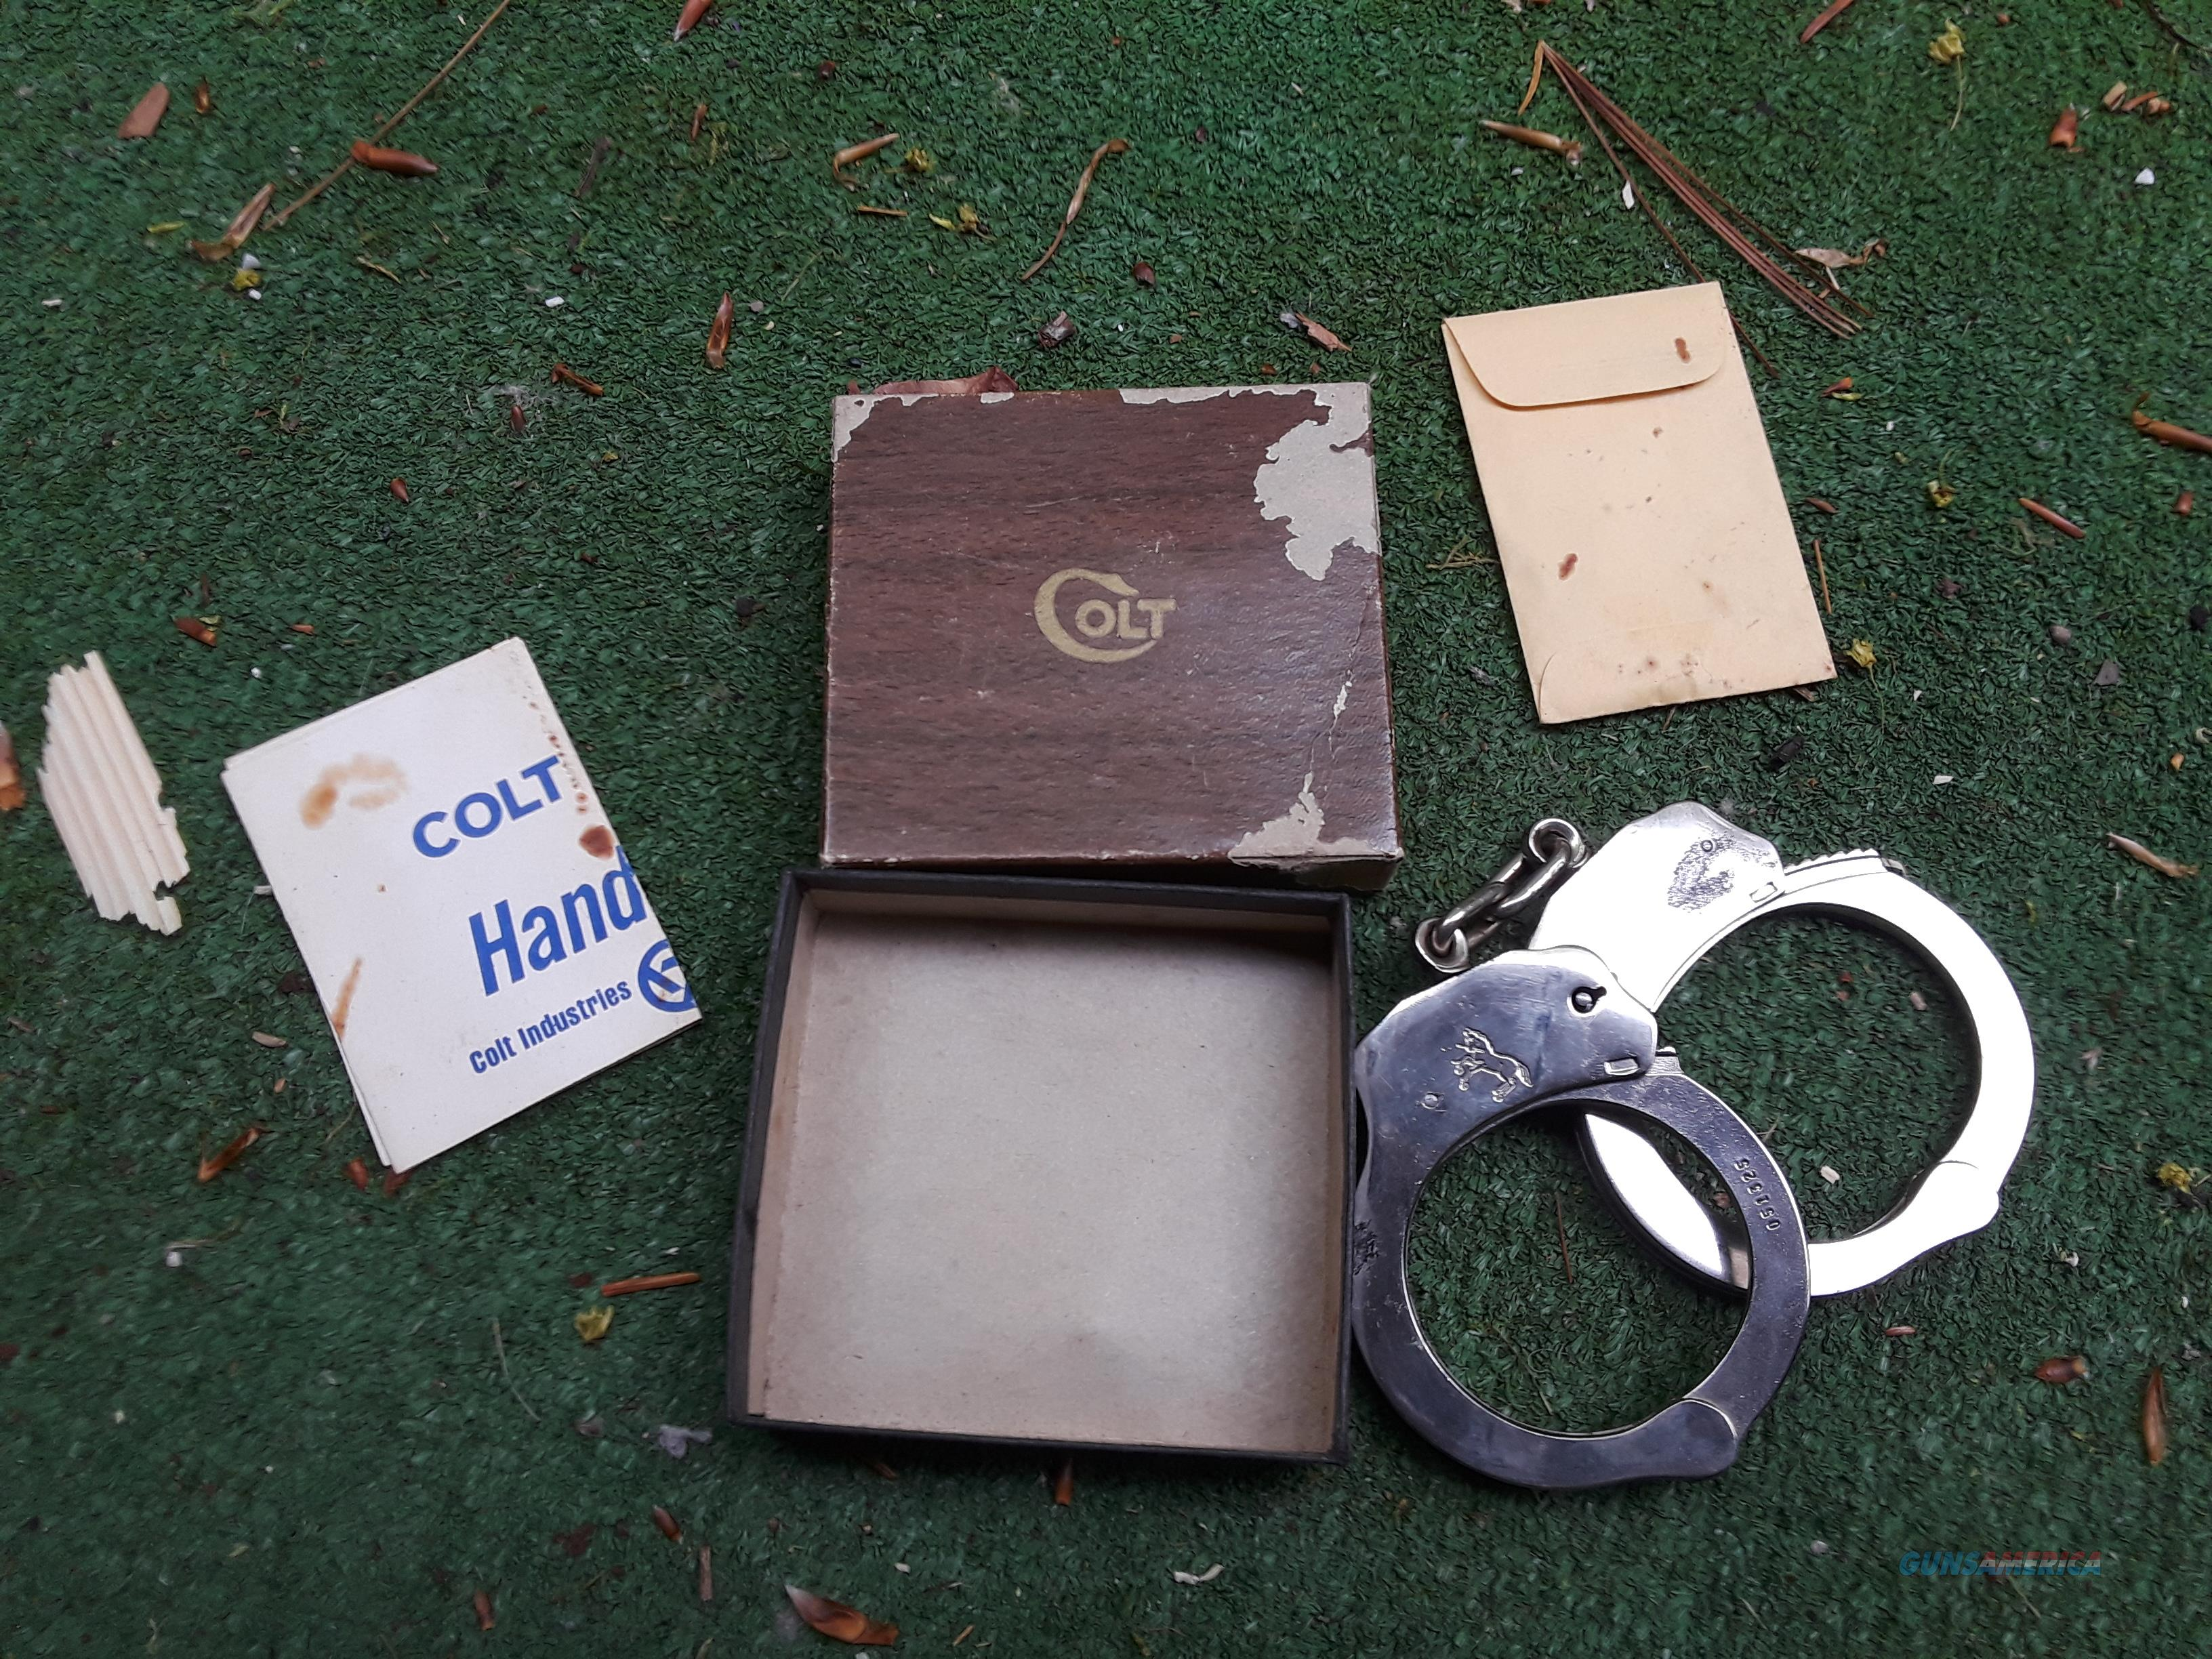 Colt Handcuffs with Box  Non-Guns > Logo & Clothing Merchandise